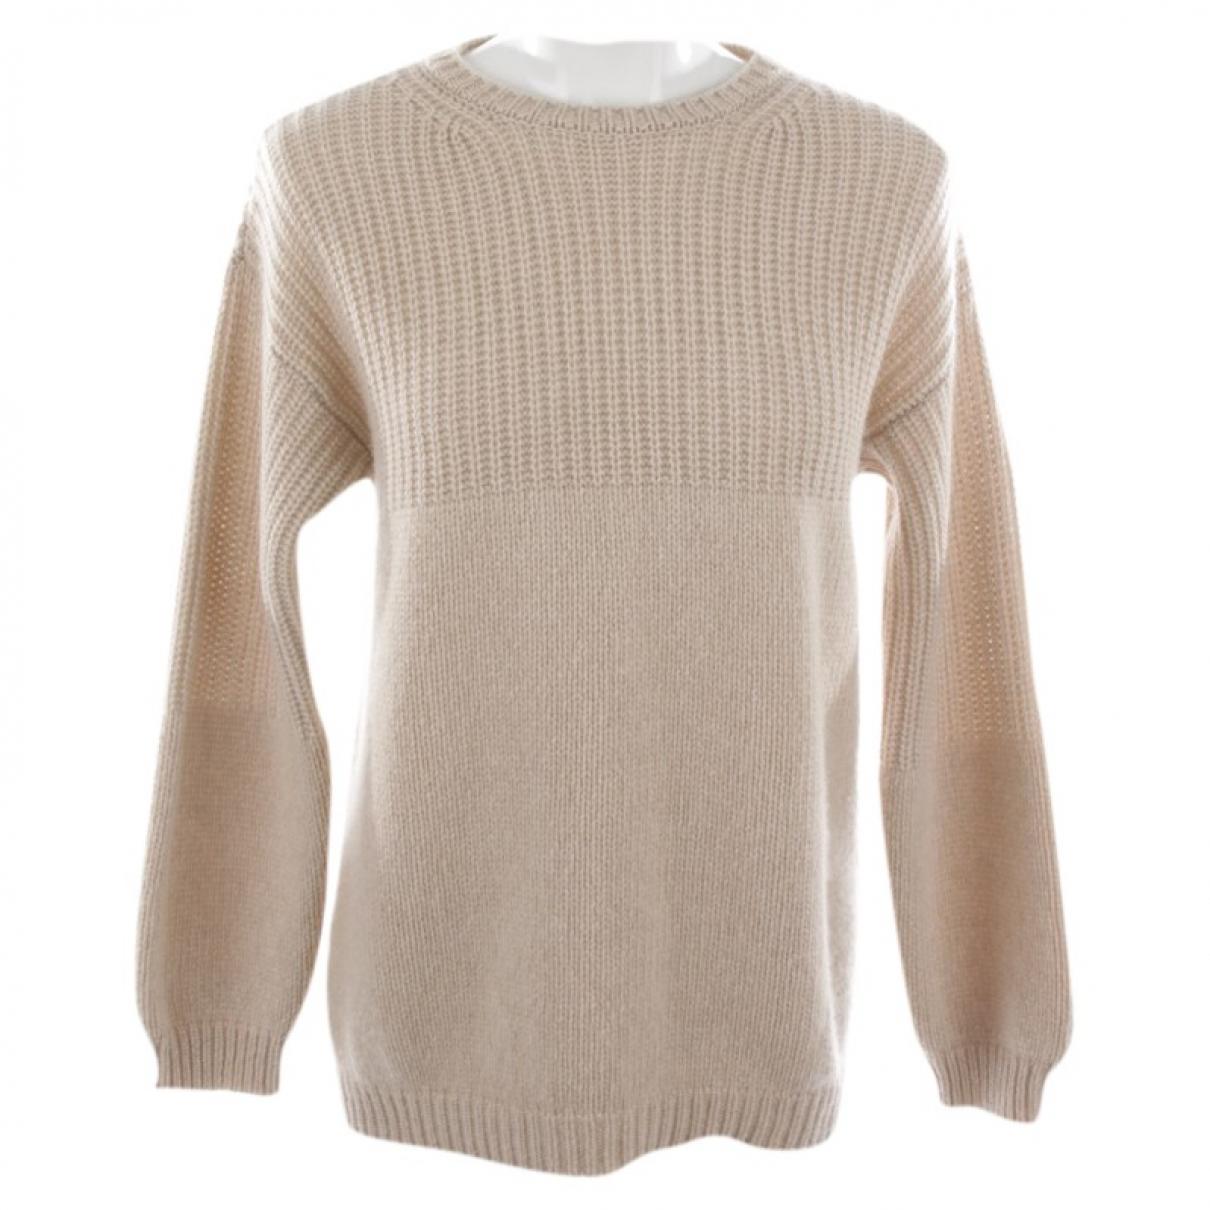 Autre Marque \N Beige Cashmere Knitwear for Women 36 FR